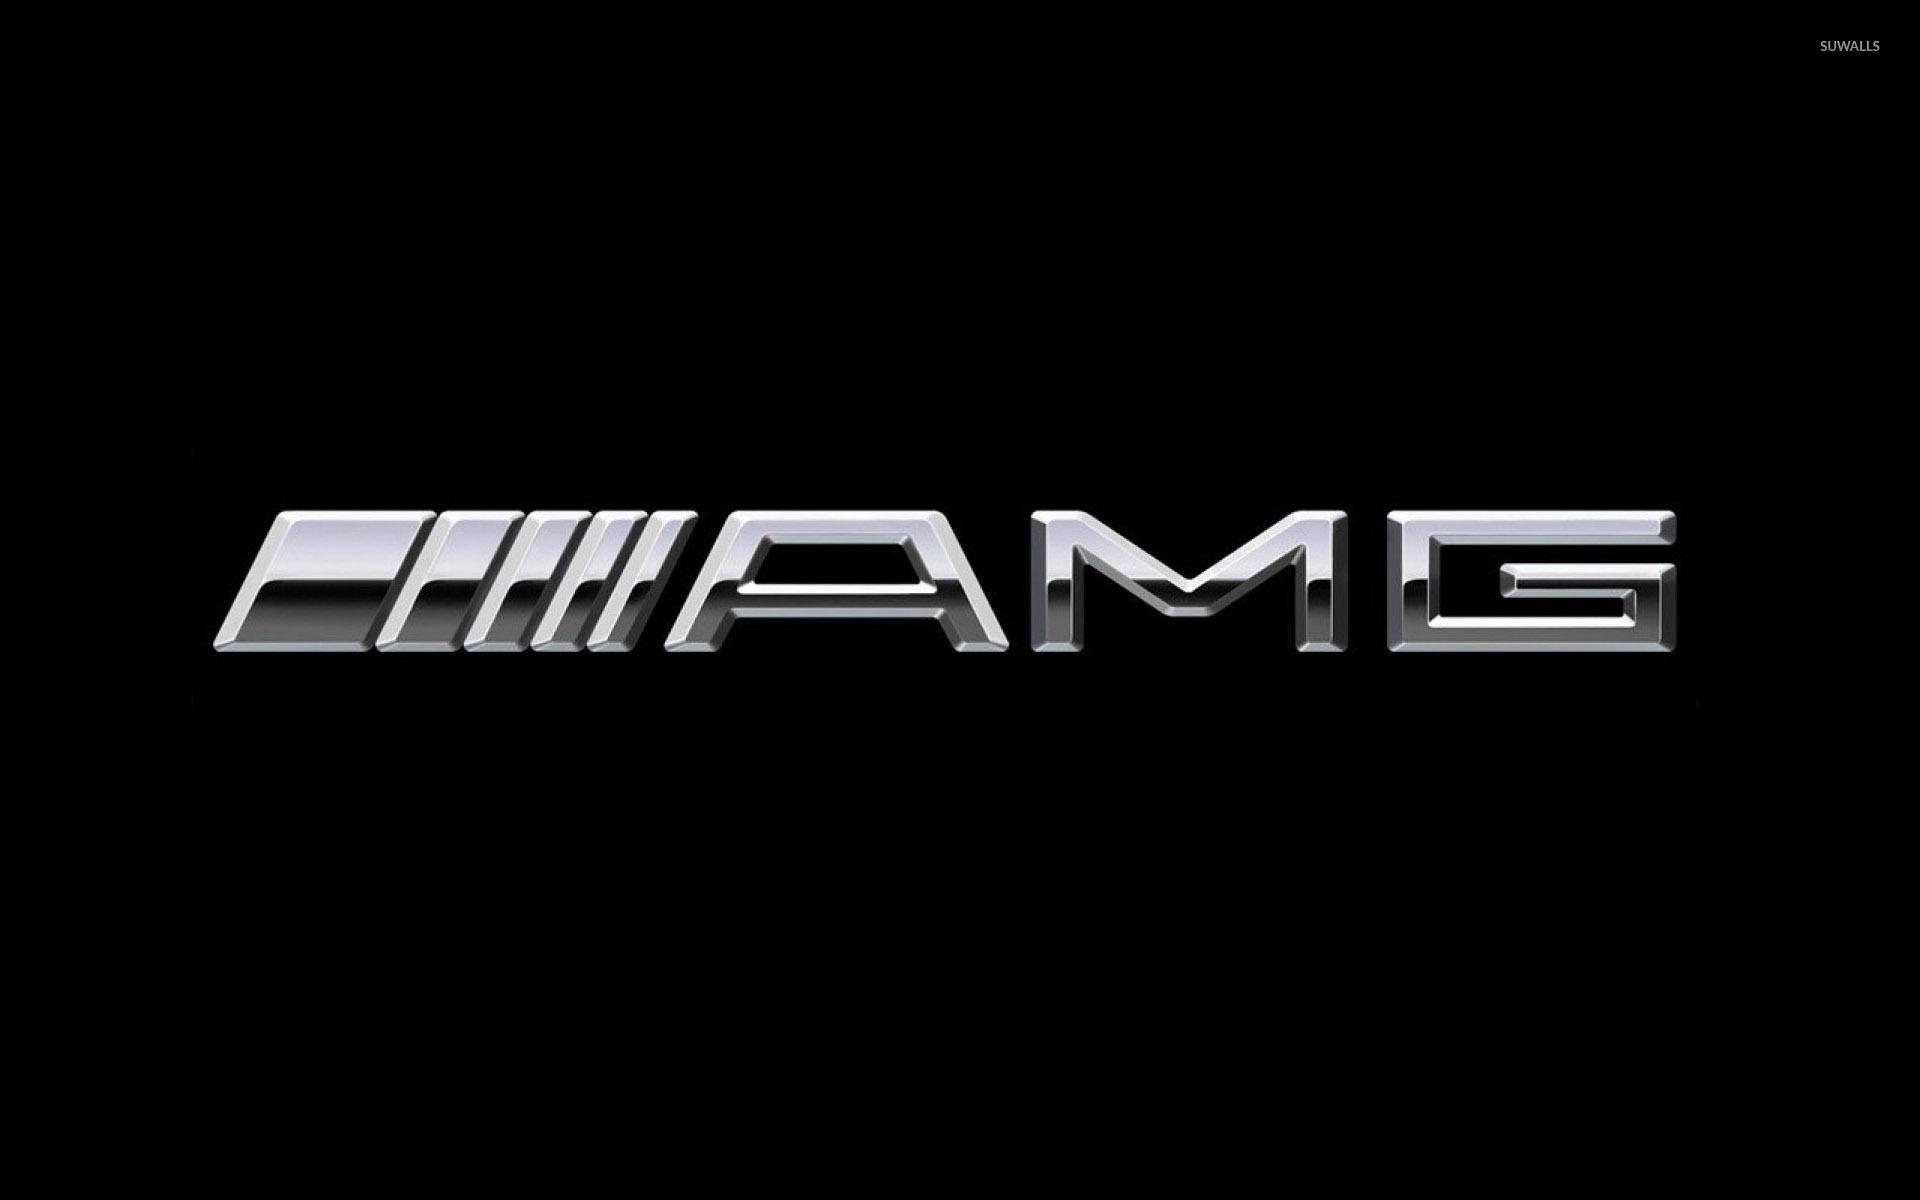 Mercedes Benz AMG logo wallpaper   Car wallpapers   26412 1920x1200